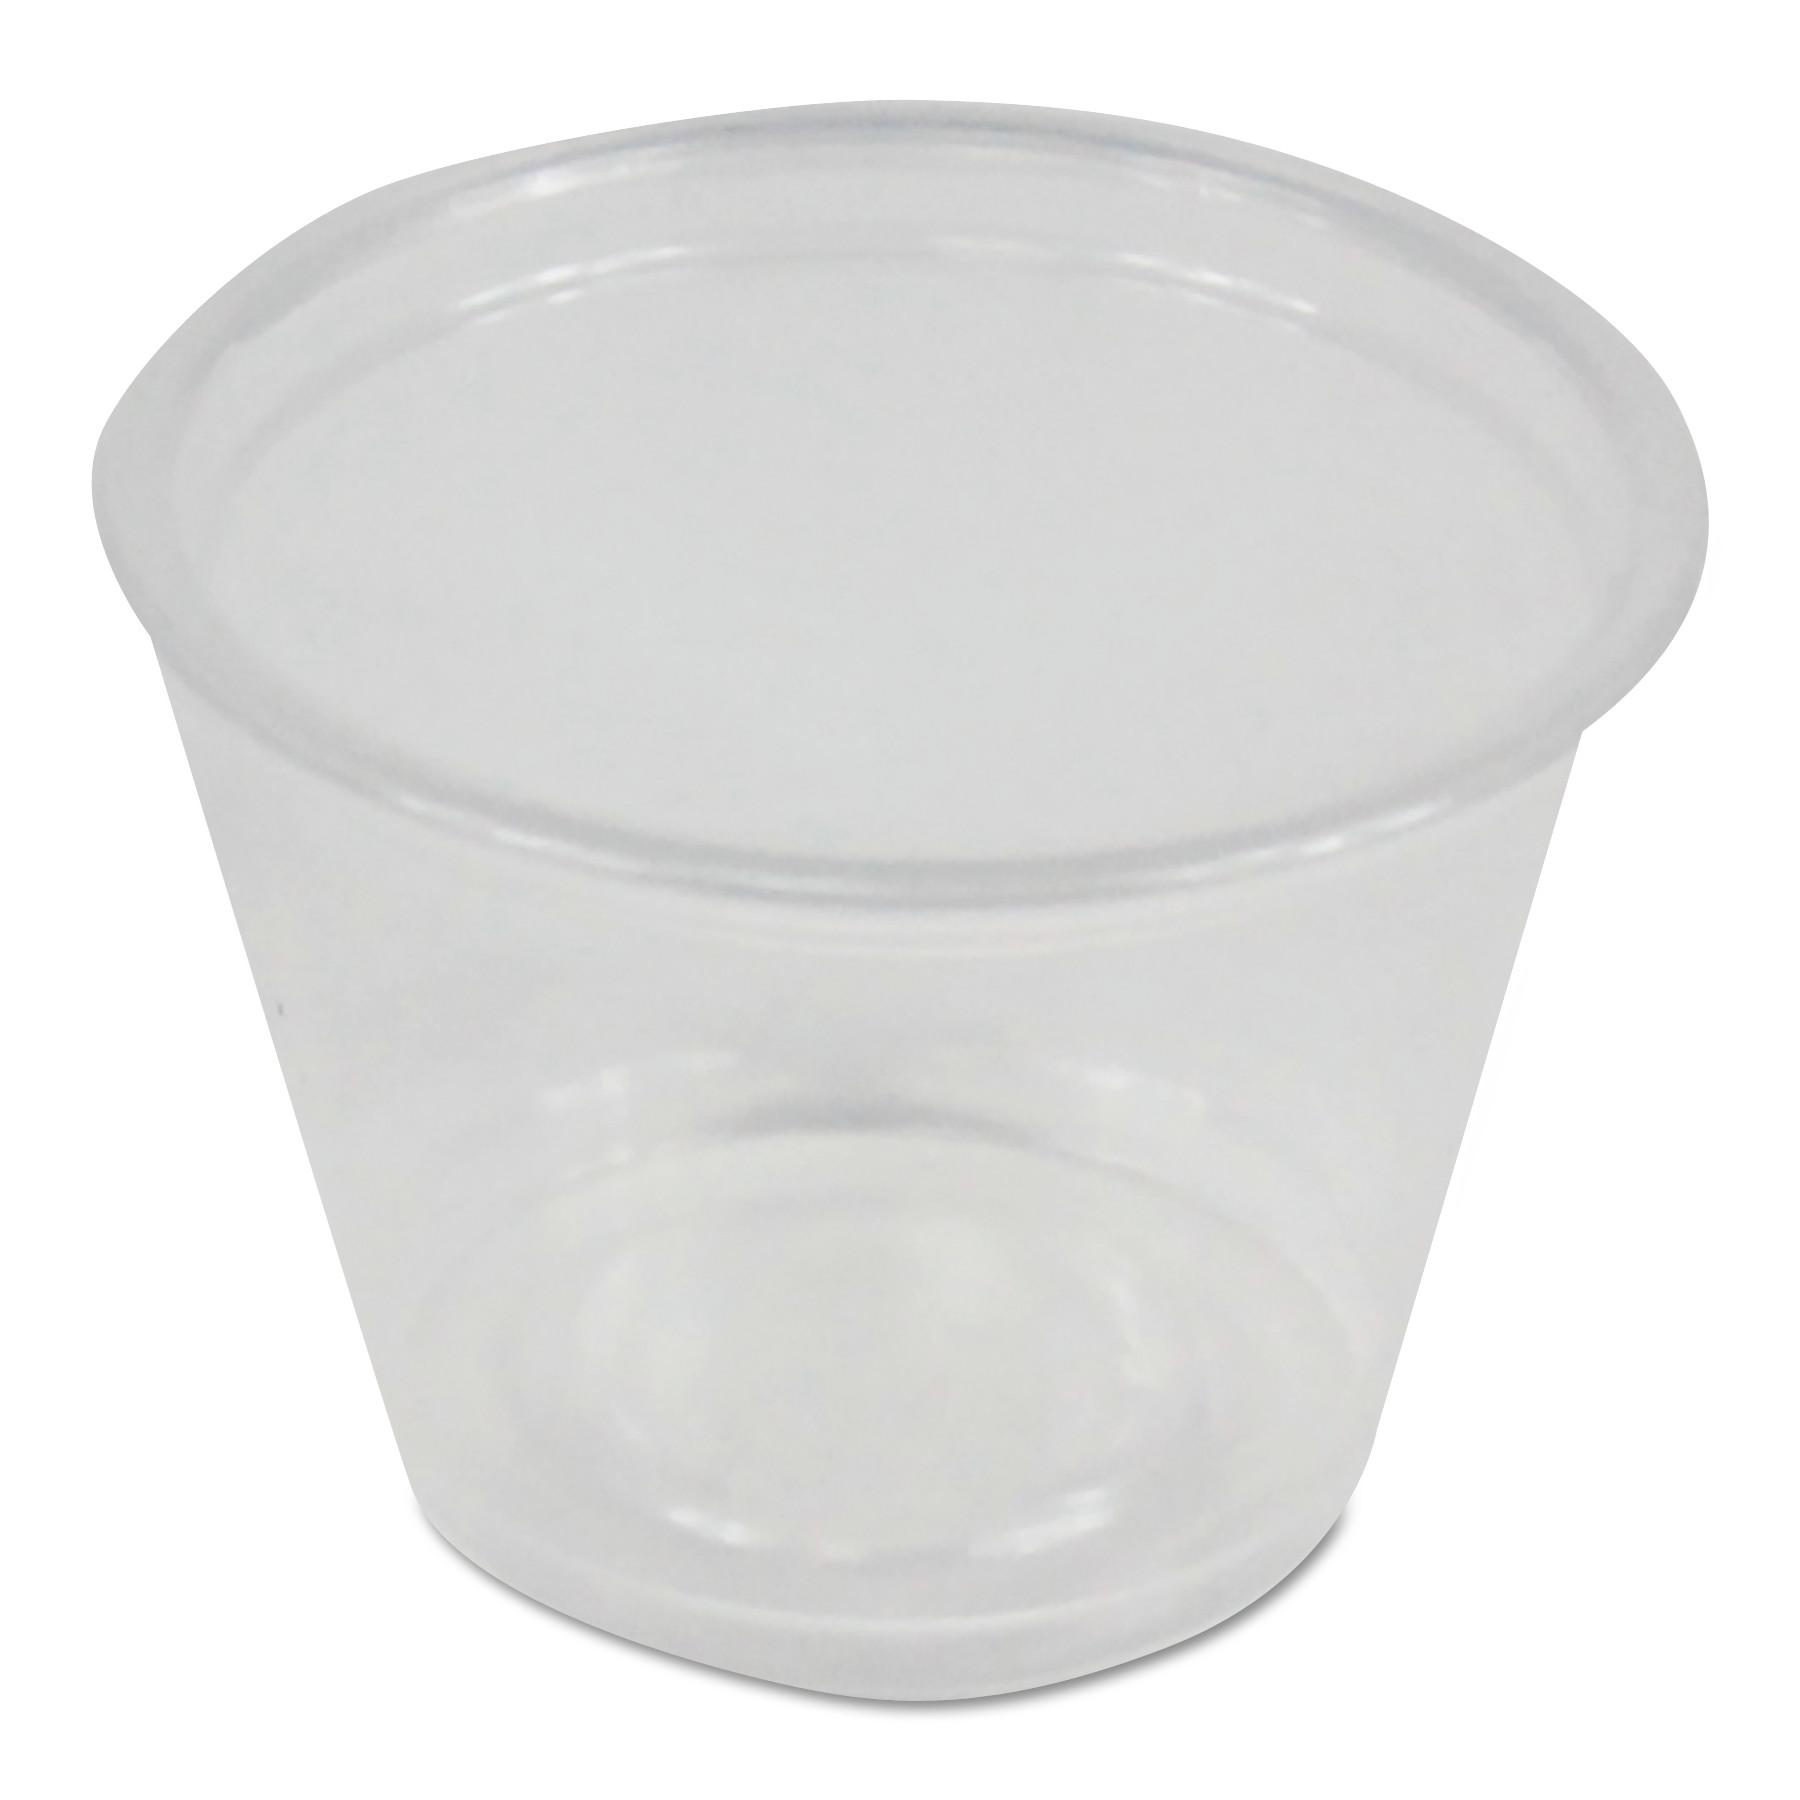 Soufflé/Portion Cups, 1 oz, Polypropylene, Clear, 20 Cups/Sleeve, 125 Sleeves/Carton